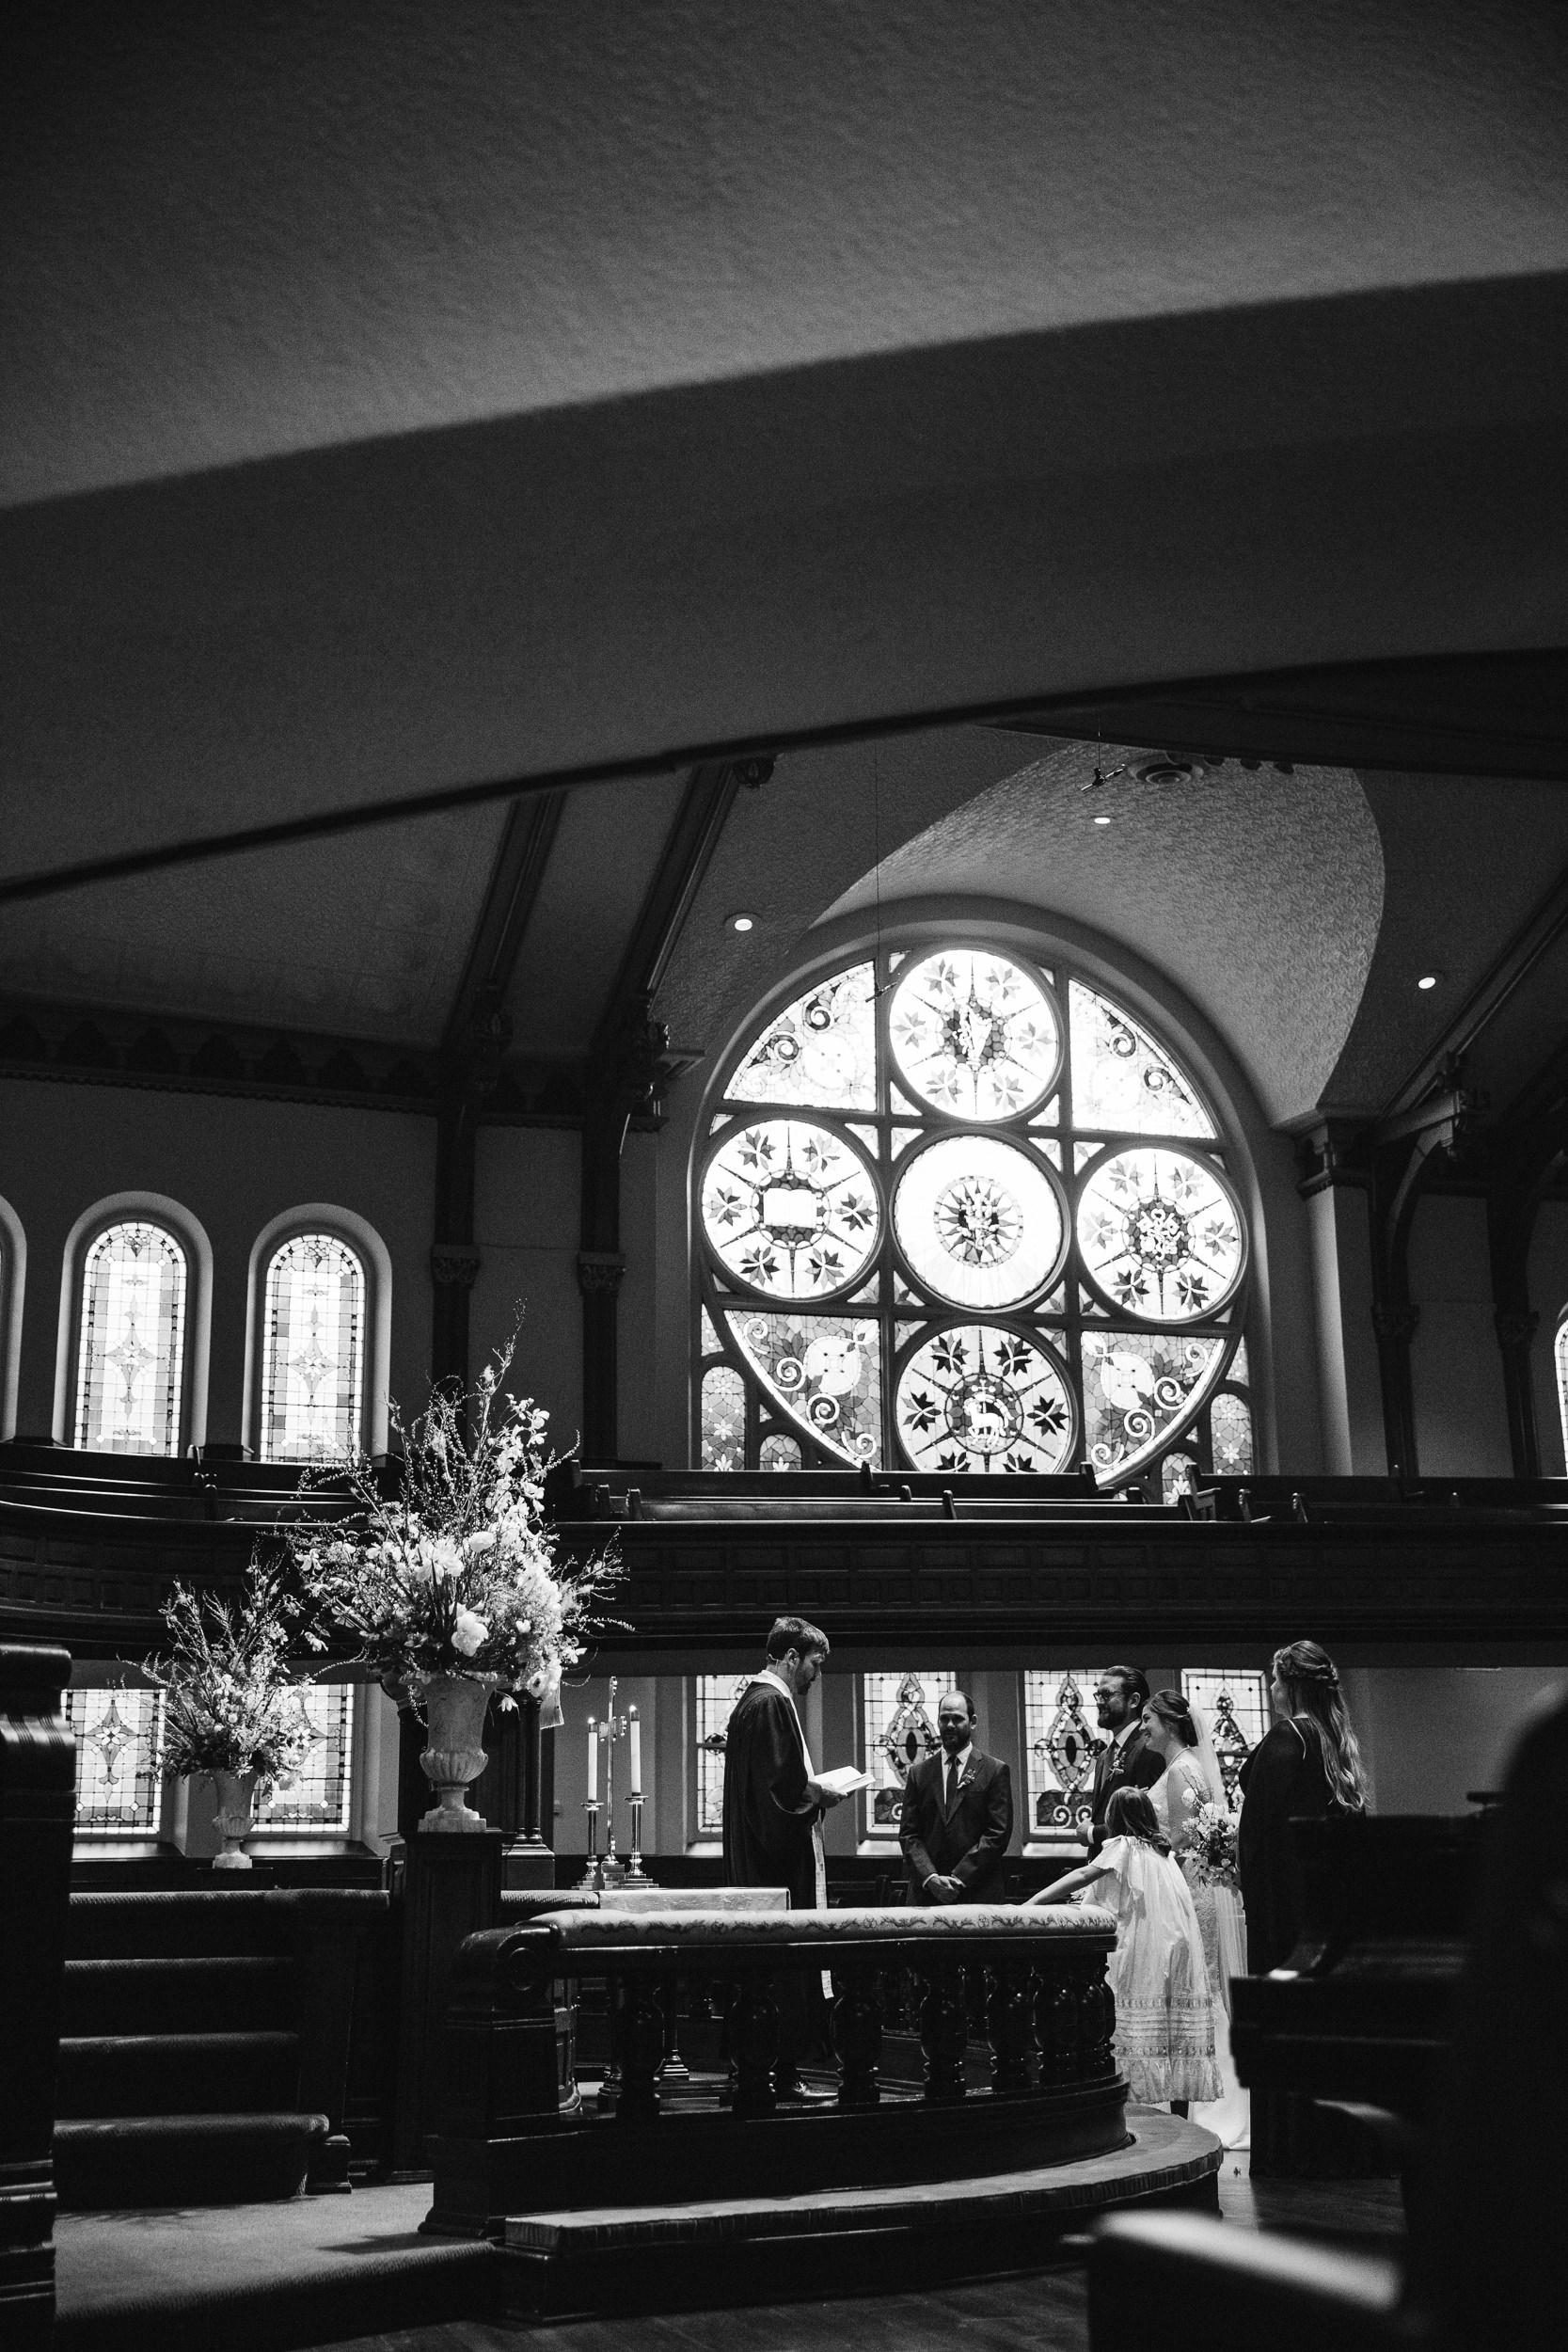 LK_Birmingham_AL_Wedding_2019-00041.jpg